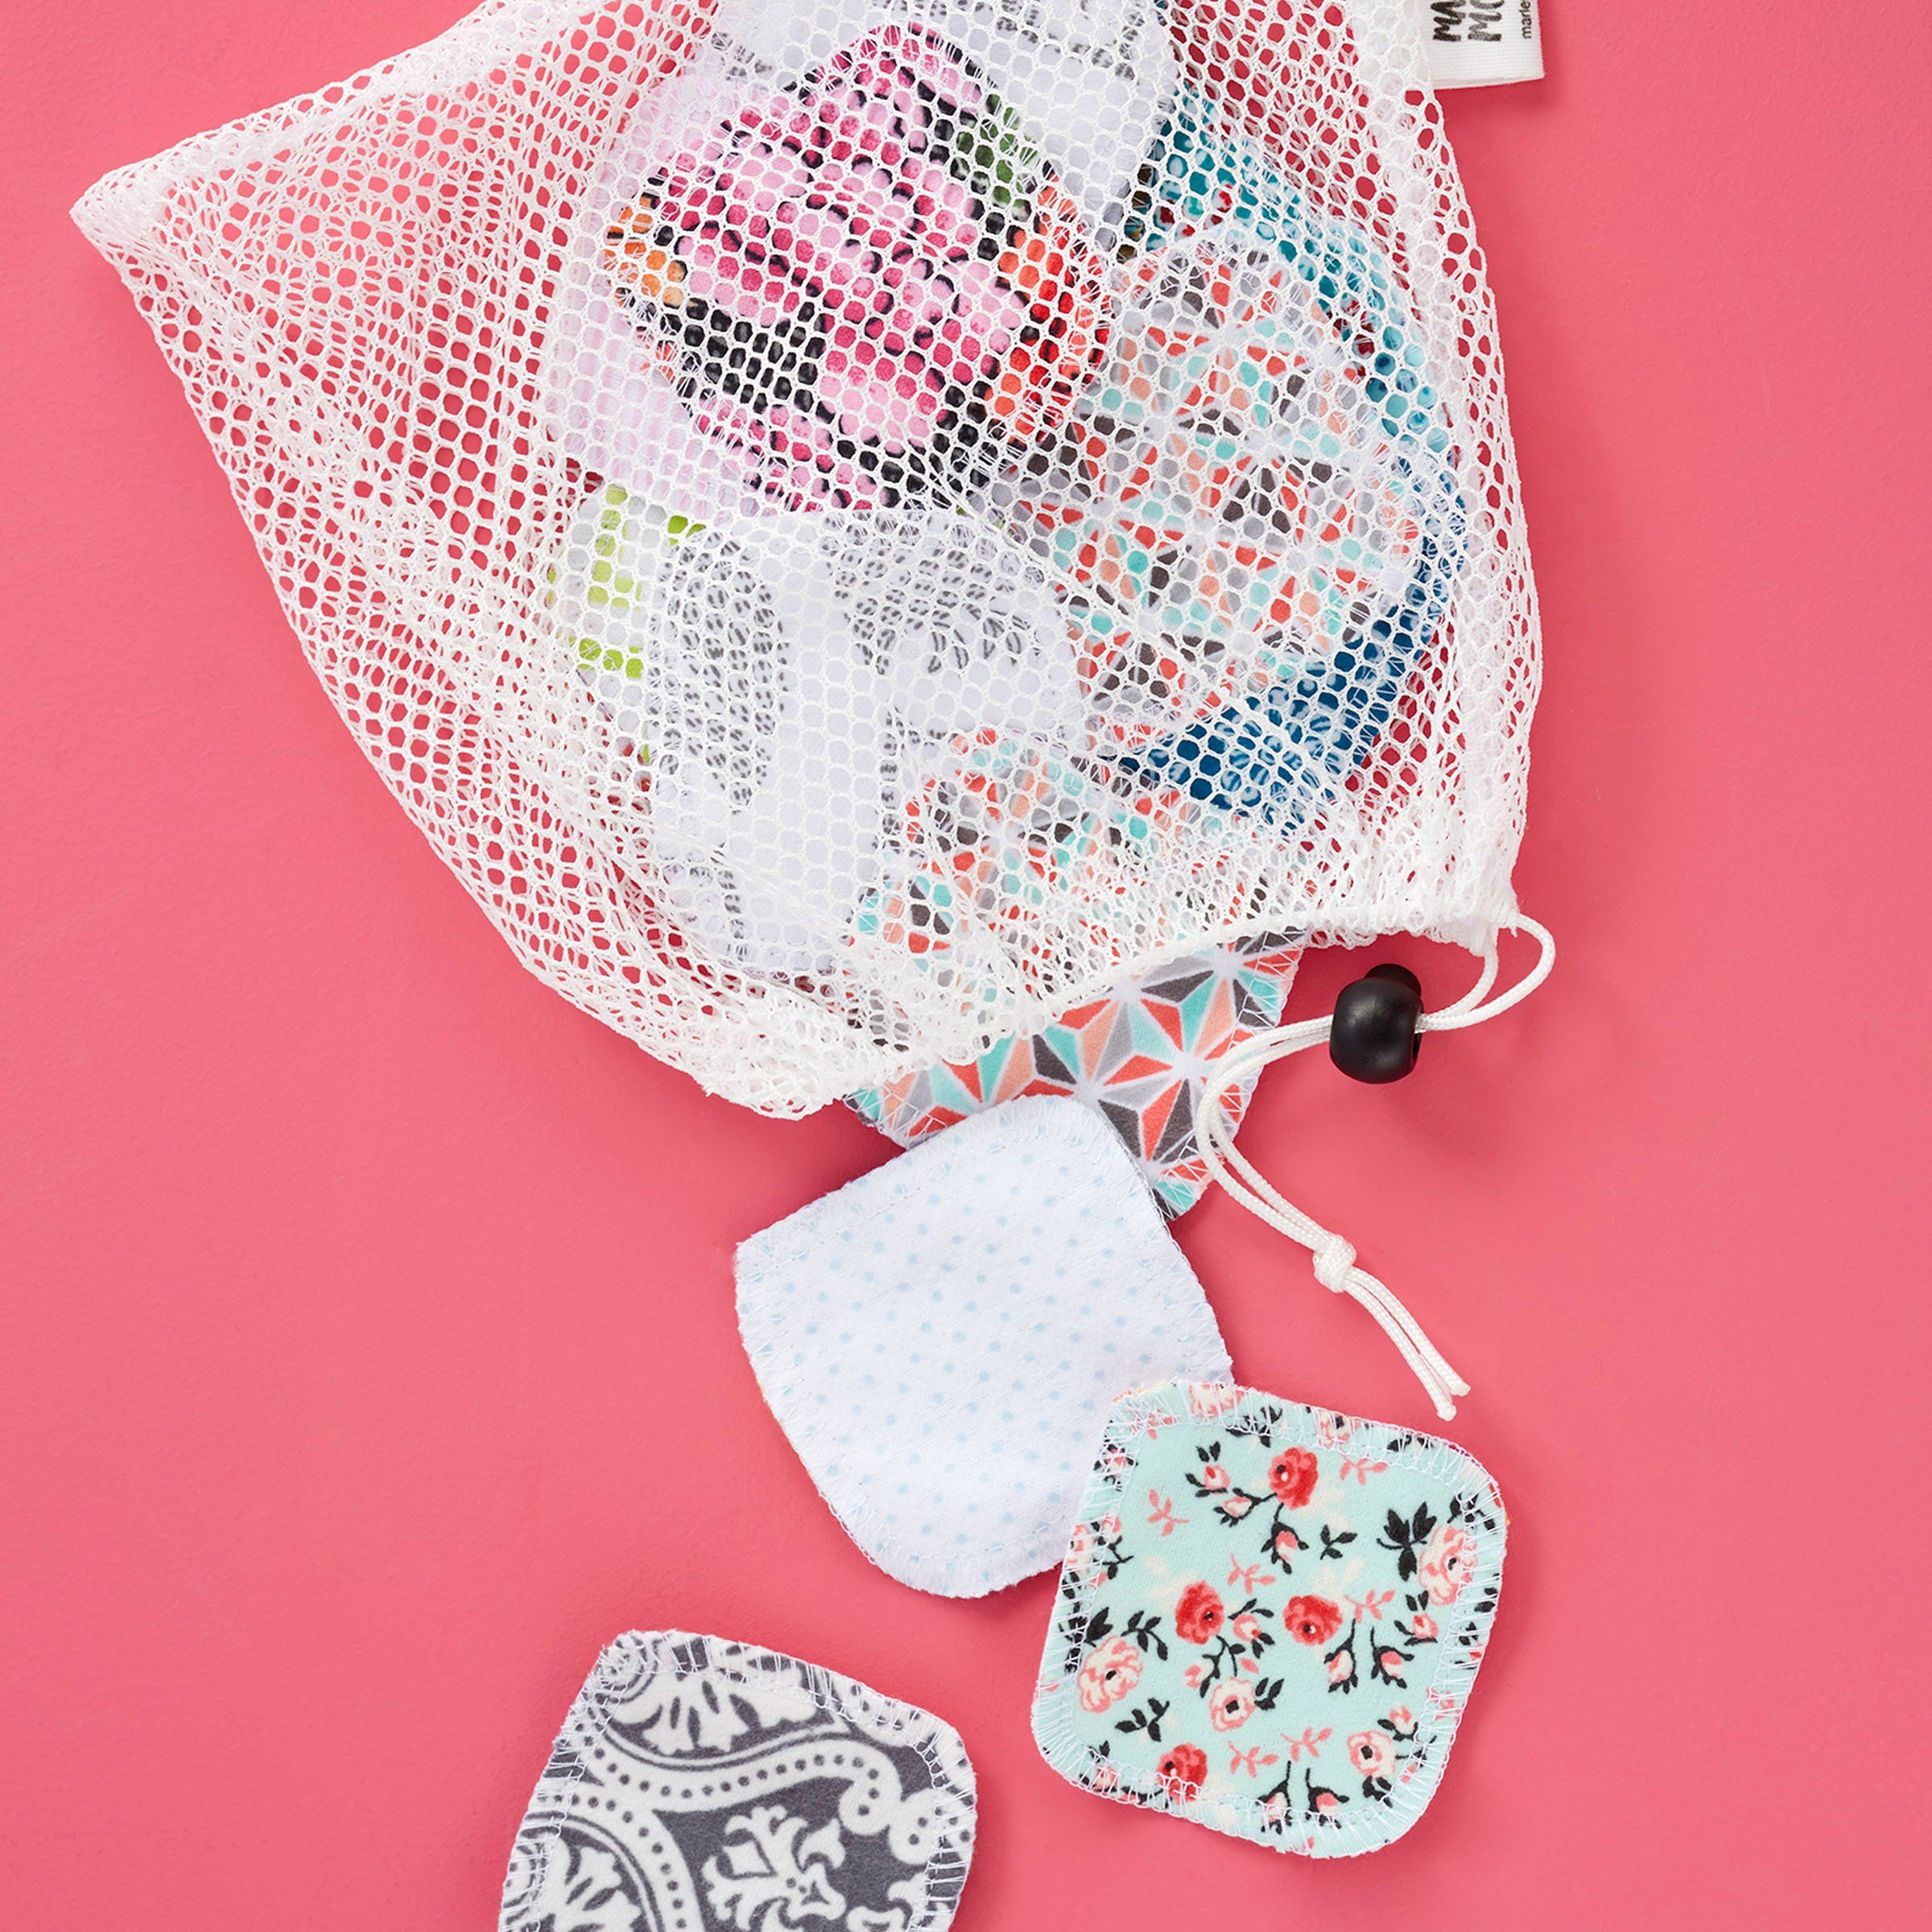 Mesh Laundry Bag Facial Rounds Set Mesh Laundry Bags Mixing